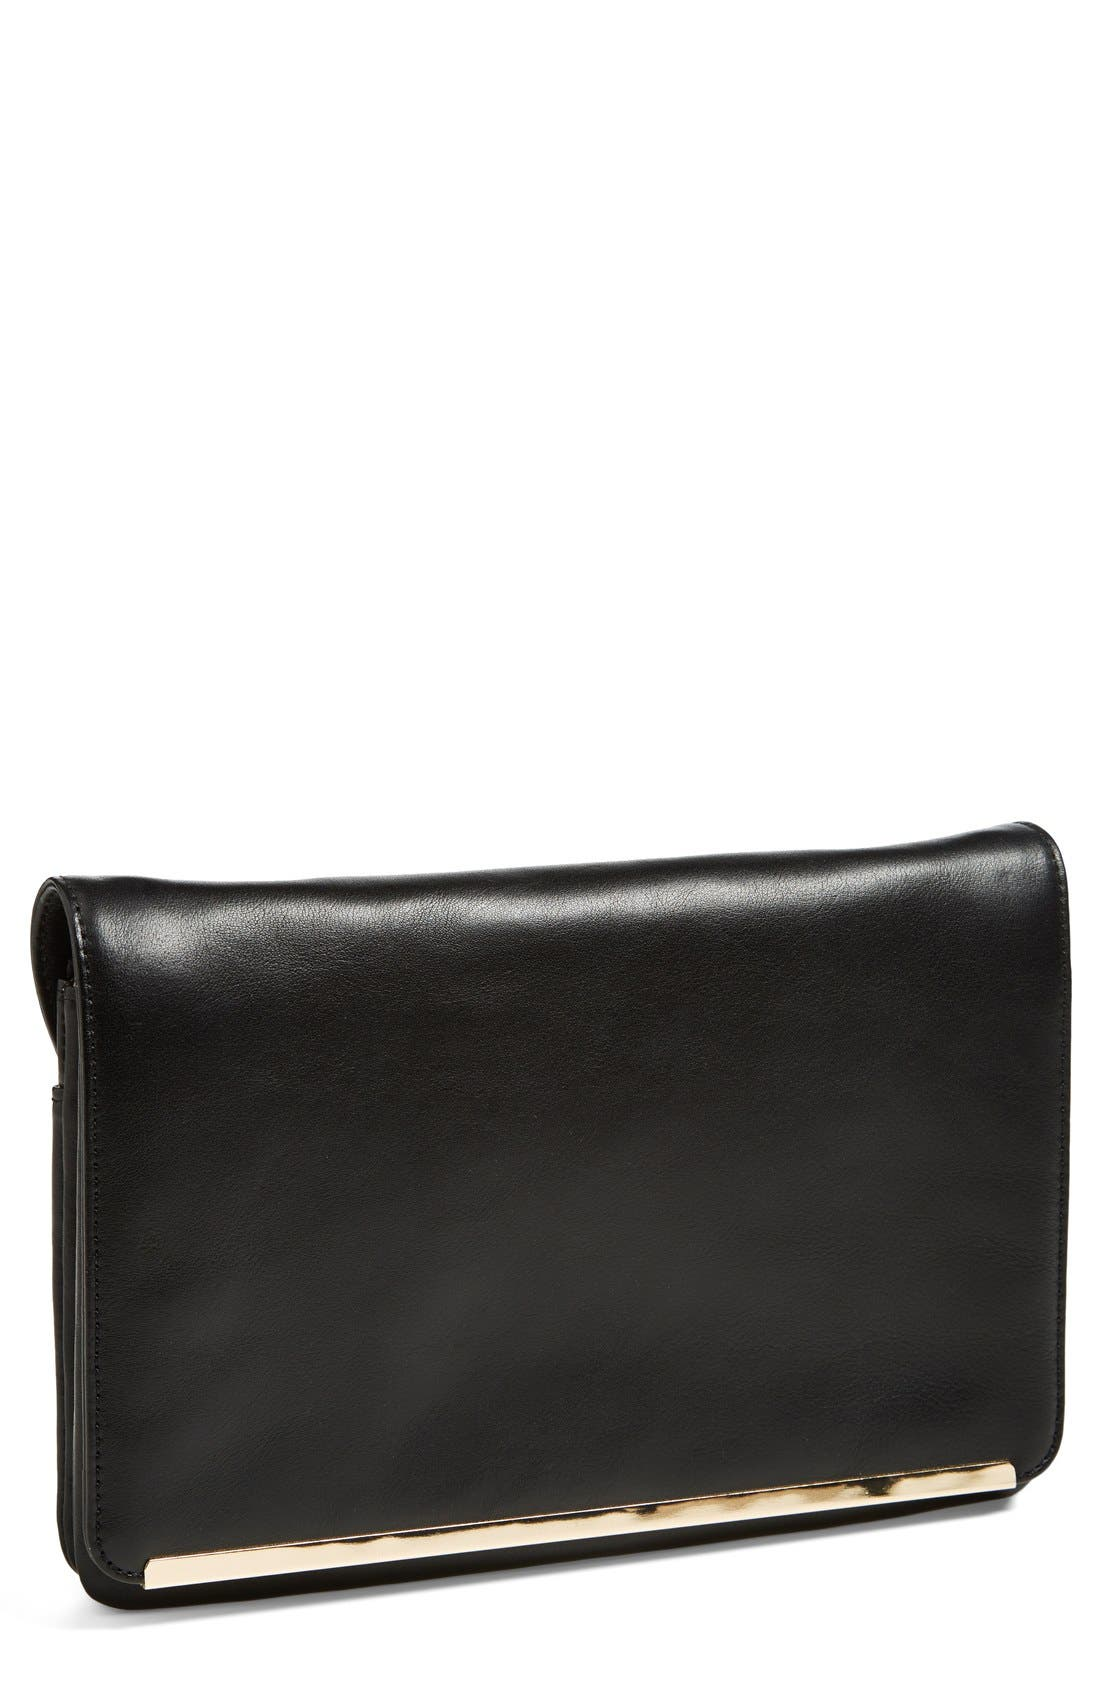 Leather Foldover Crossbody Clutch,                         Main,                         color, 001